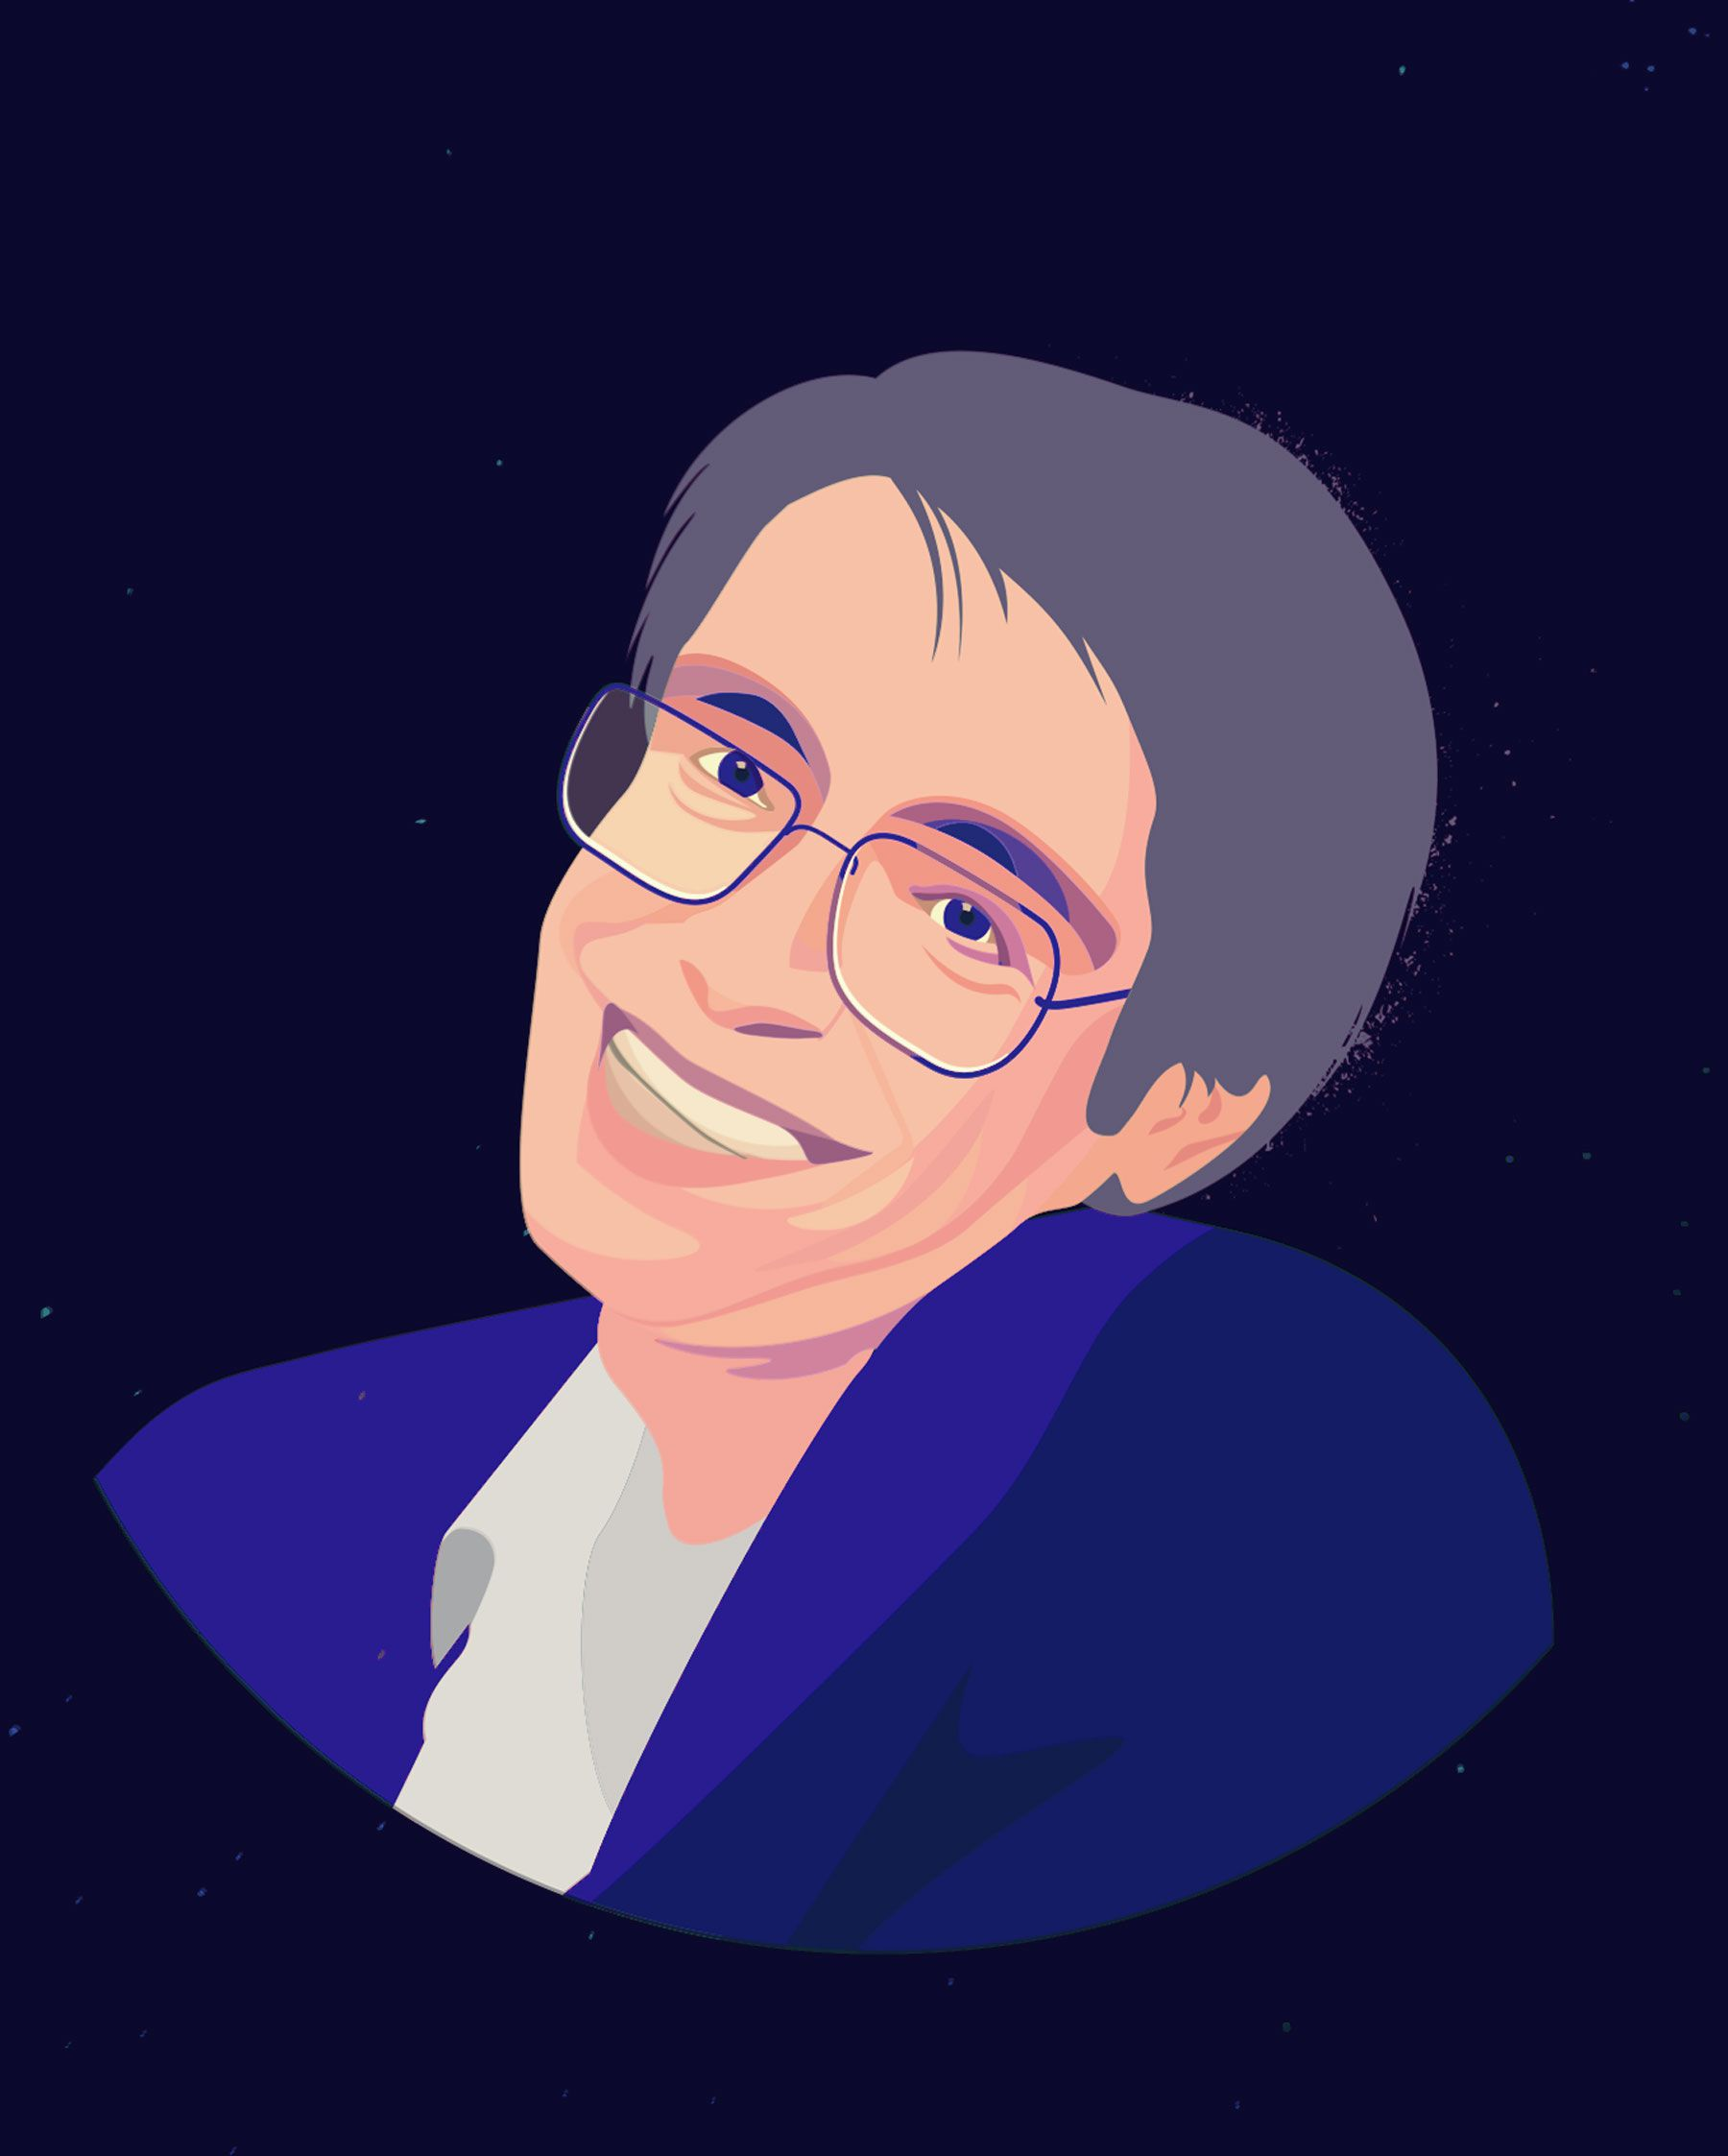 Stephen Hawking portrait illustration